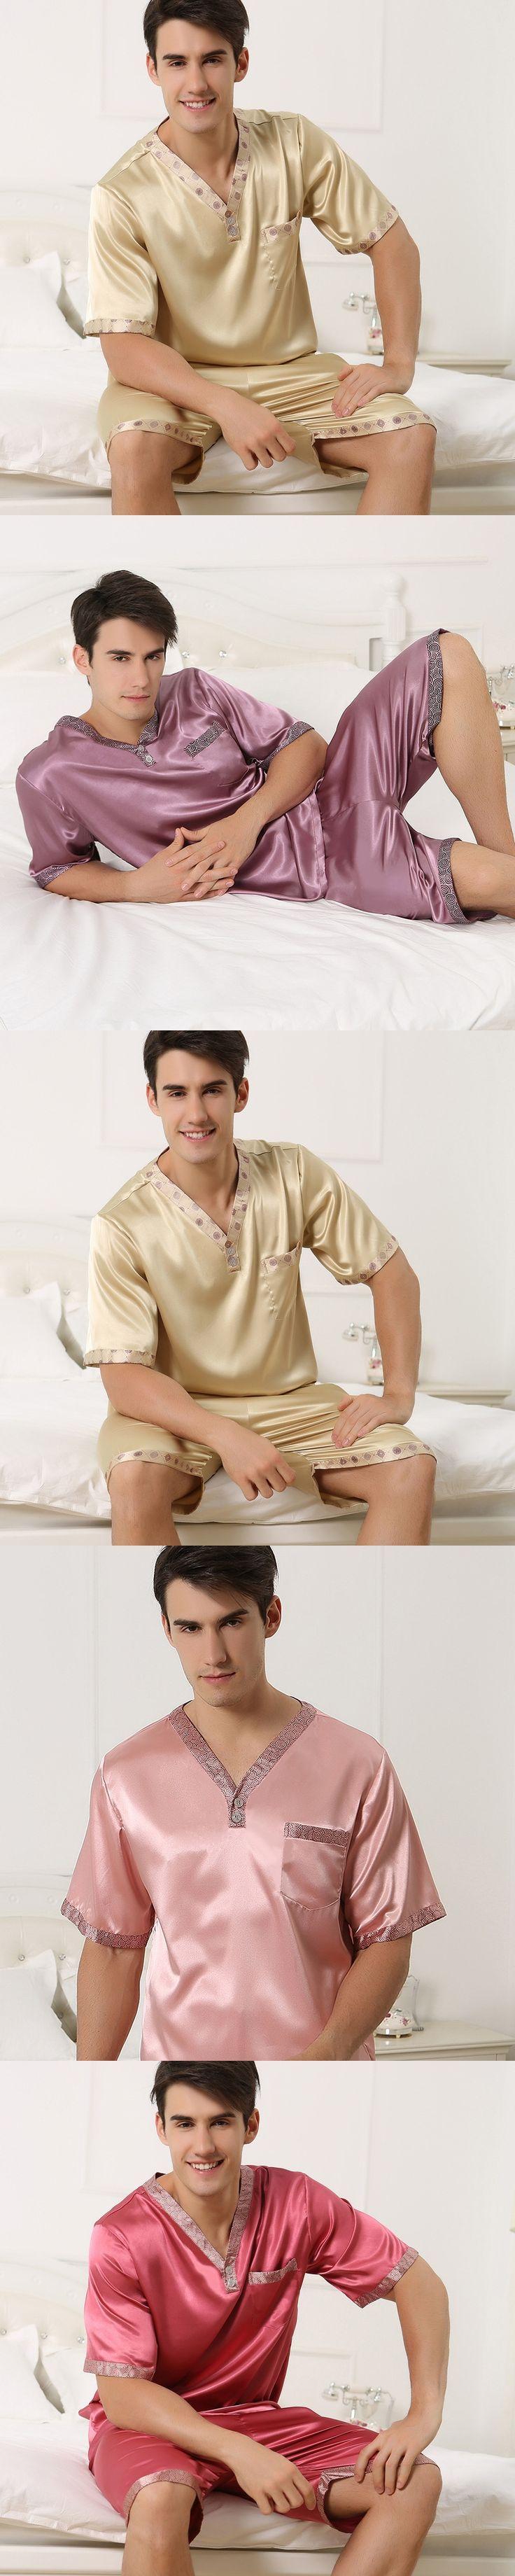 Summer men's silk pajamas short sleeved v neck pyjamas twinset with shorts thin plus size mens sleepwear XXXL XXXXL loungewear